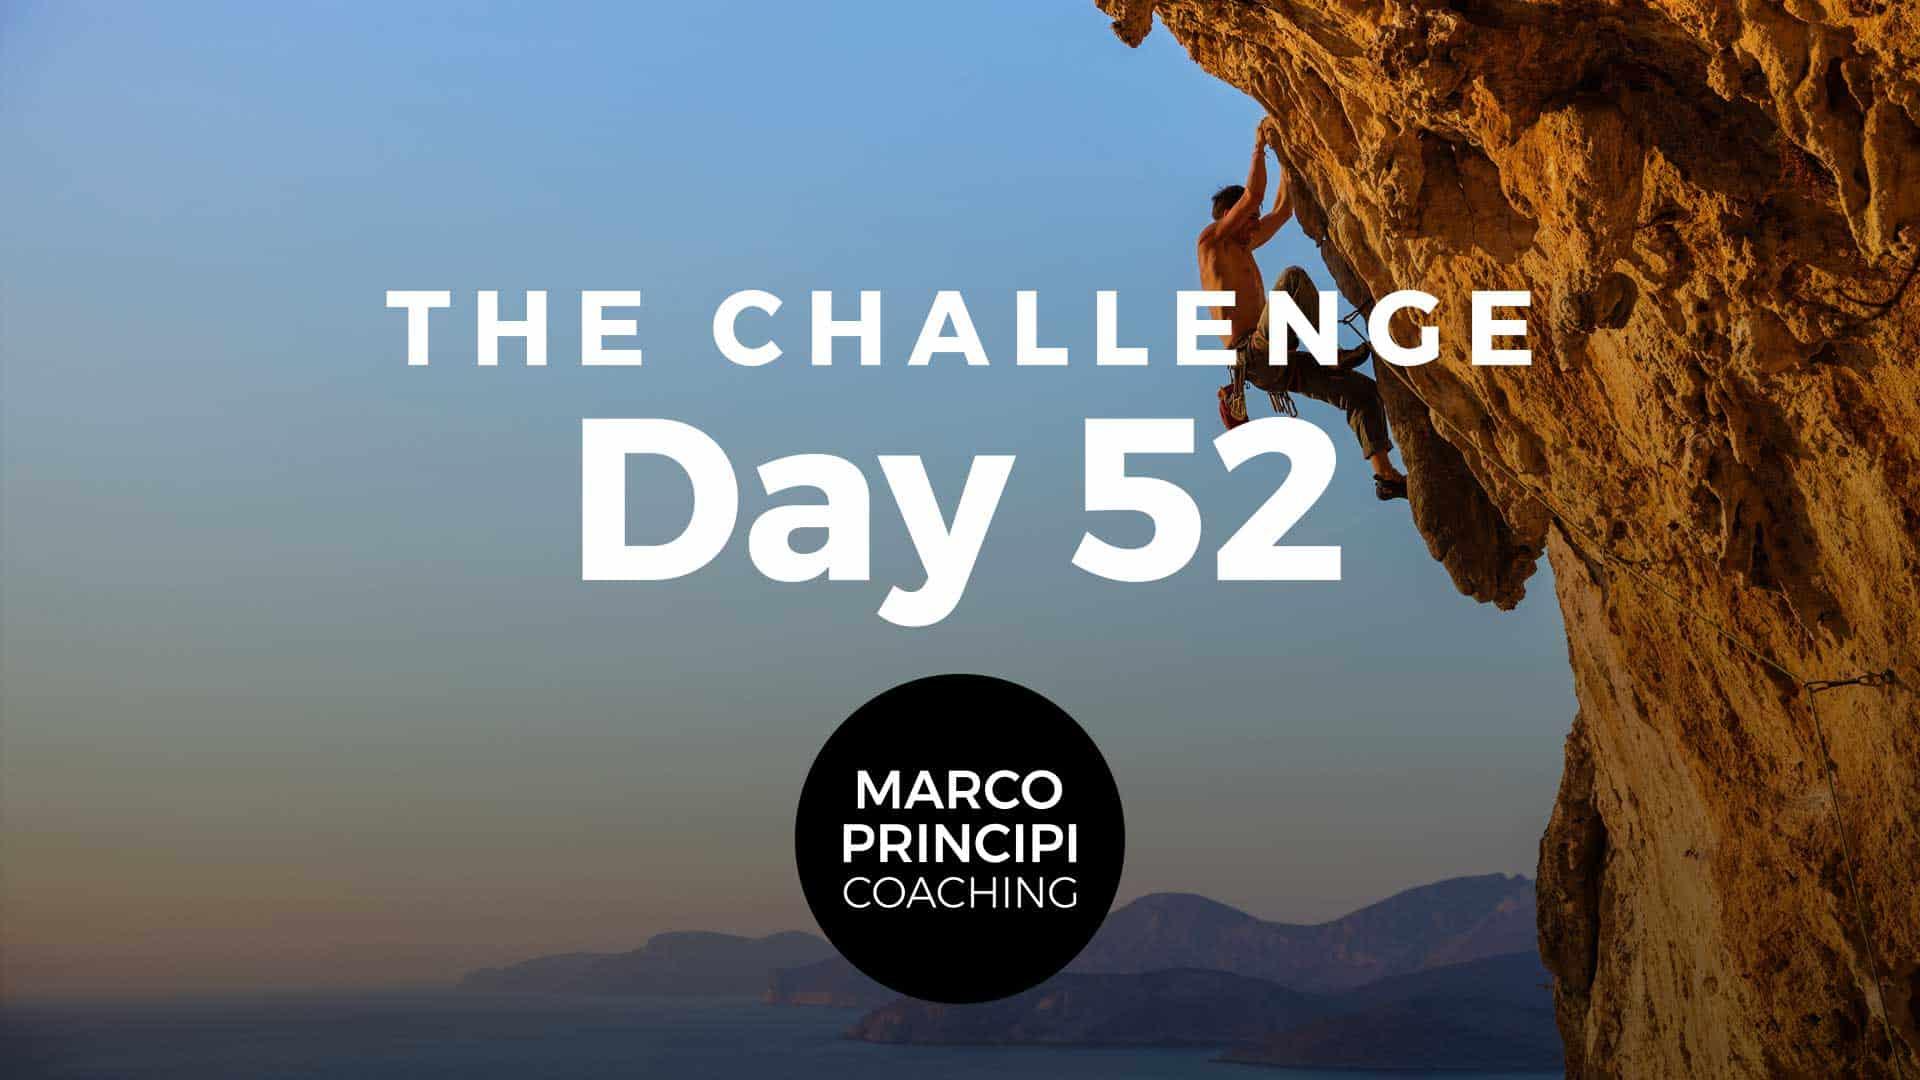 Marco Principi The Challenge Day 52